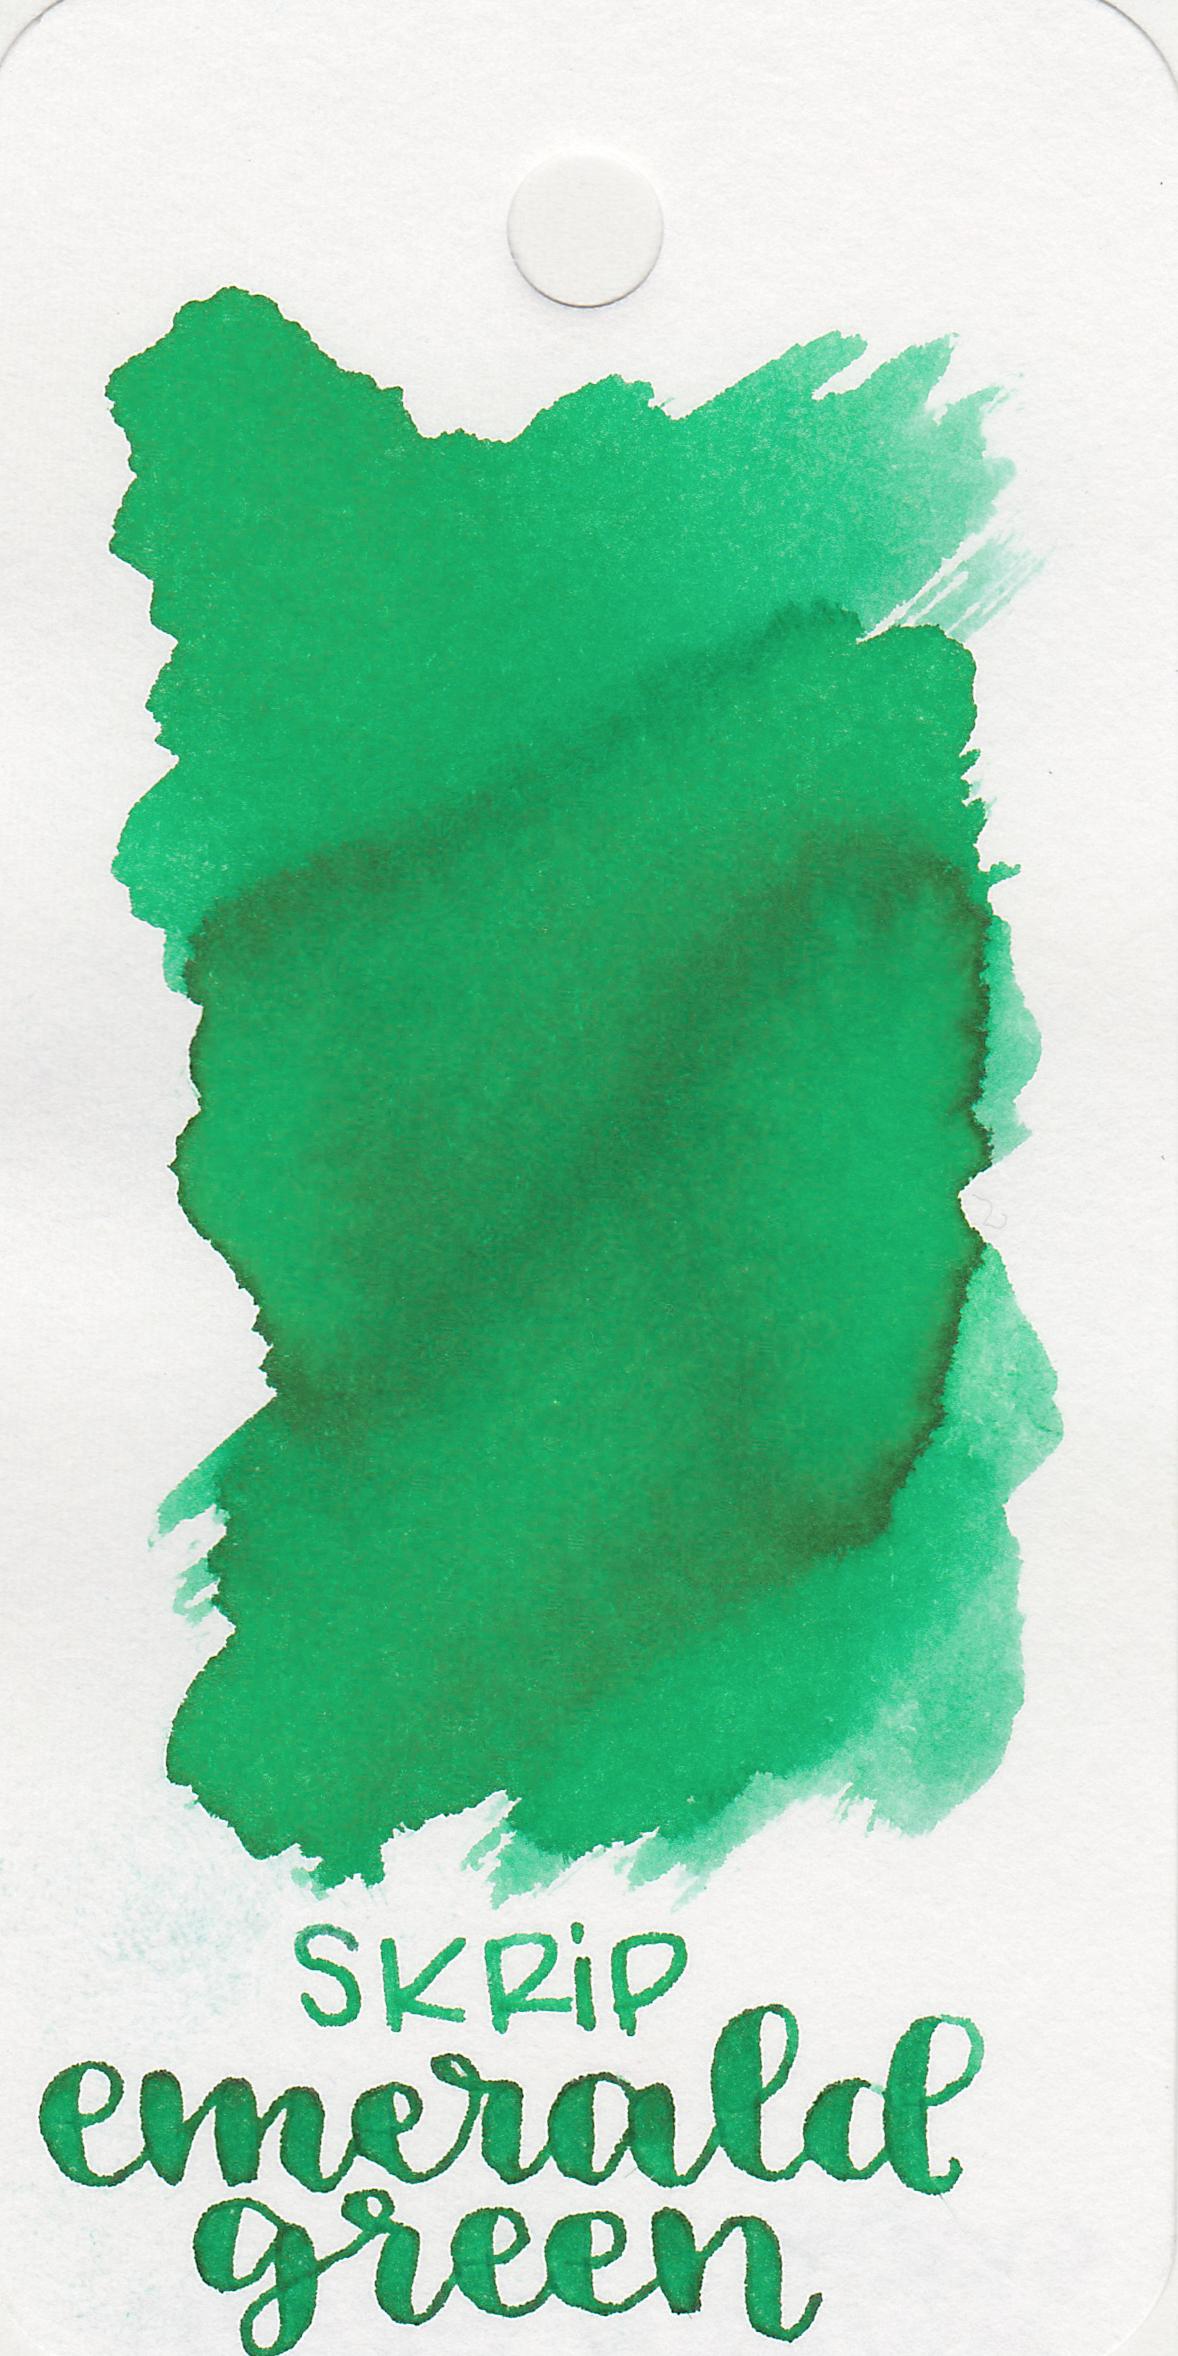 The color: - Emerald Green is a medium bright green.